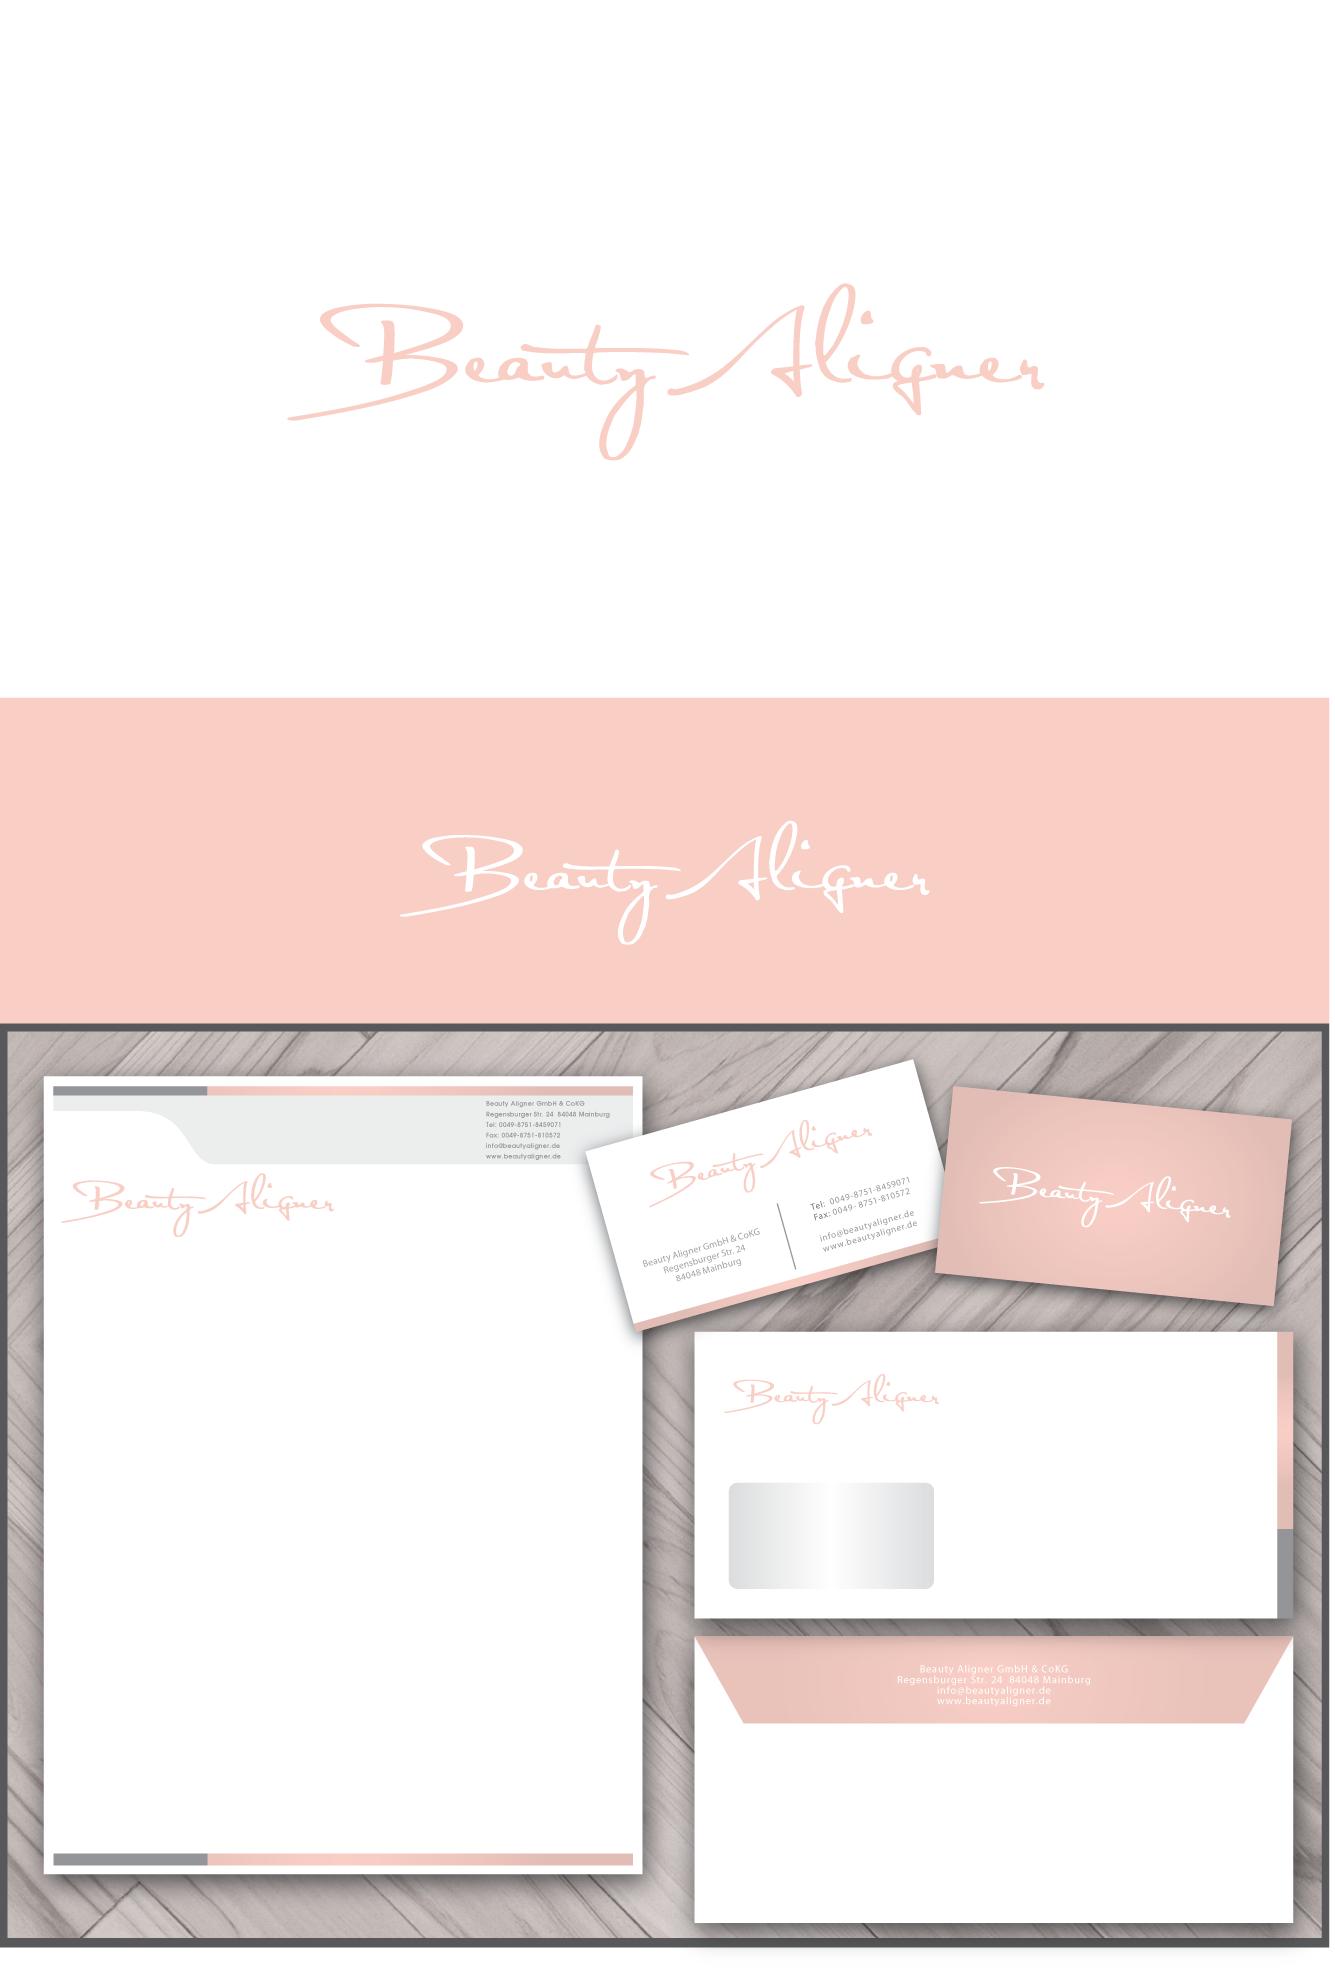 Beauty Aligner benötigt ein logo and business card